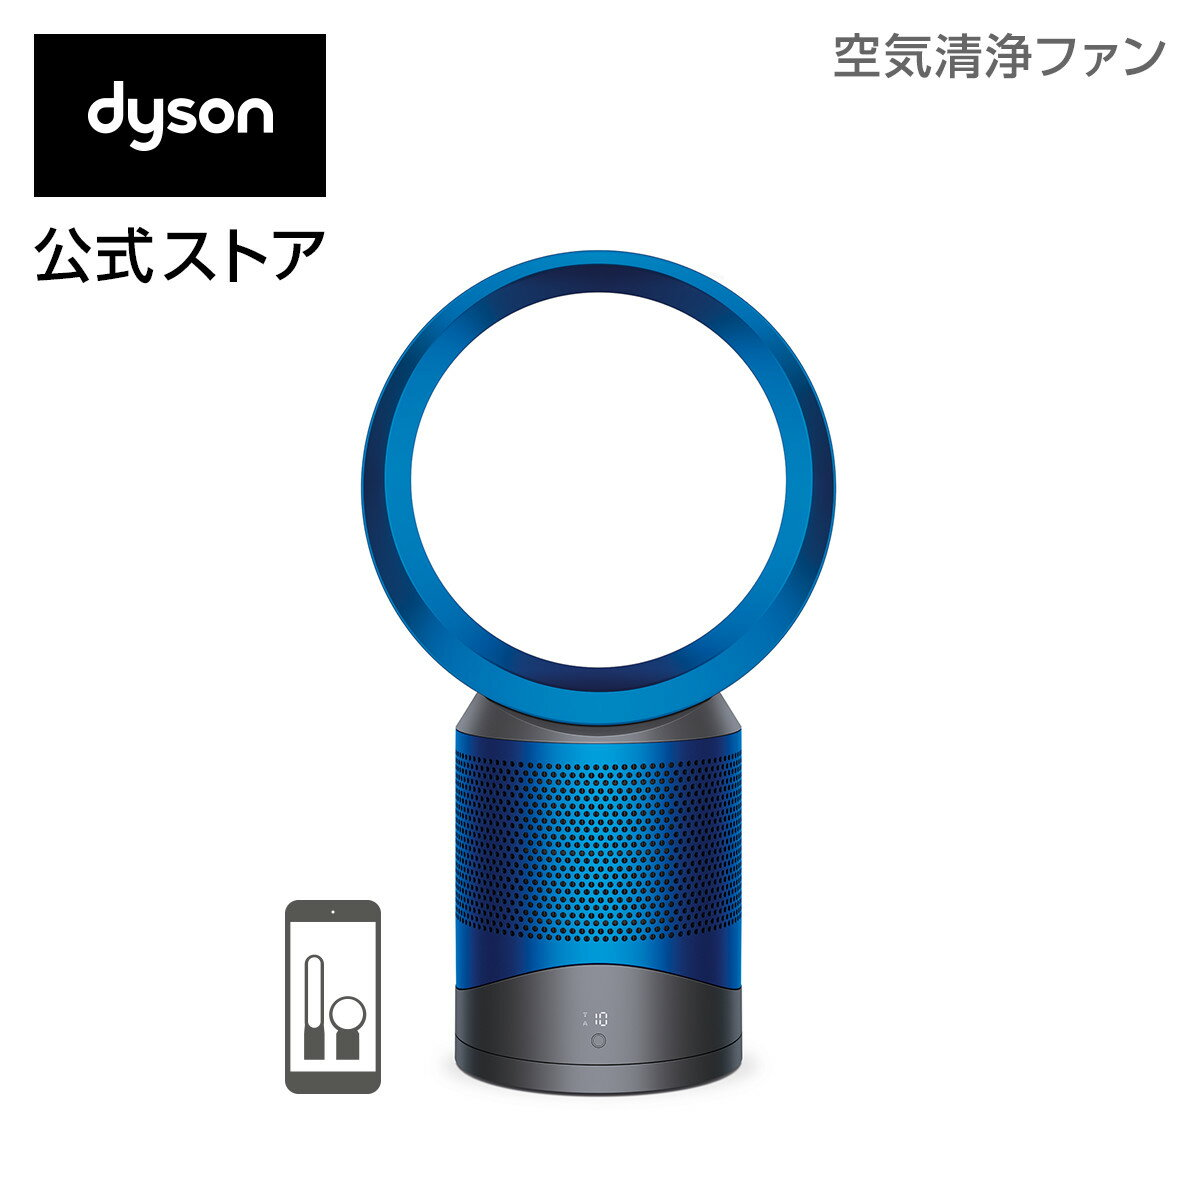 Dyson(ダイソン)『Dyson Pure Cool Link 空気清浄機能付テーブルファン(DP03IB)』